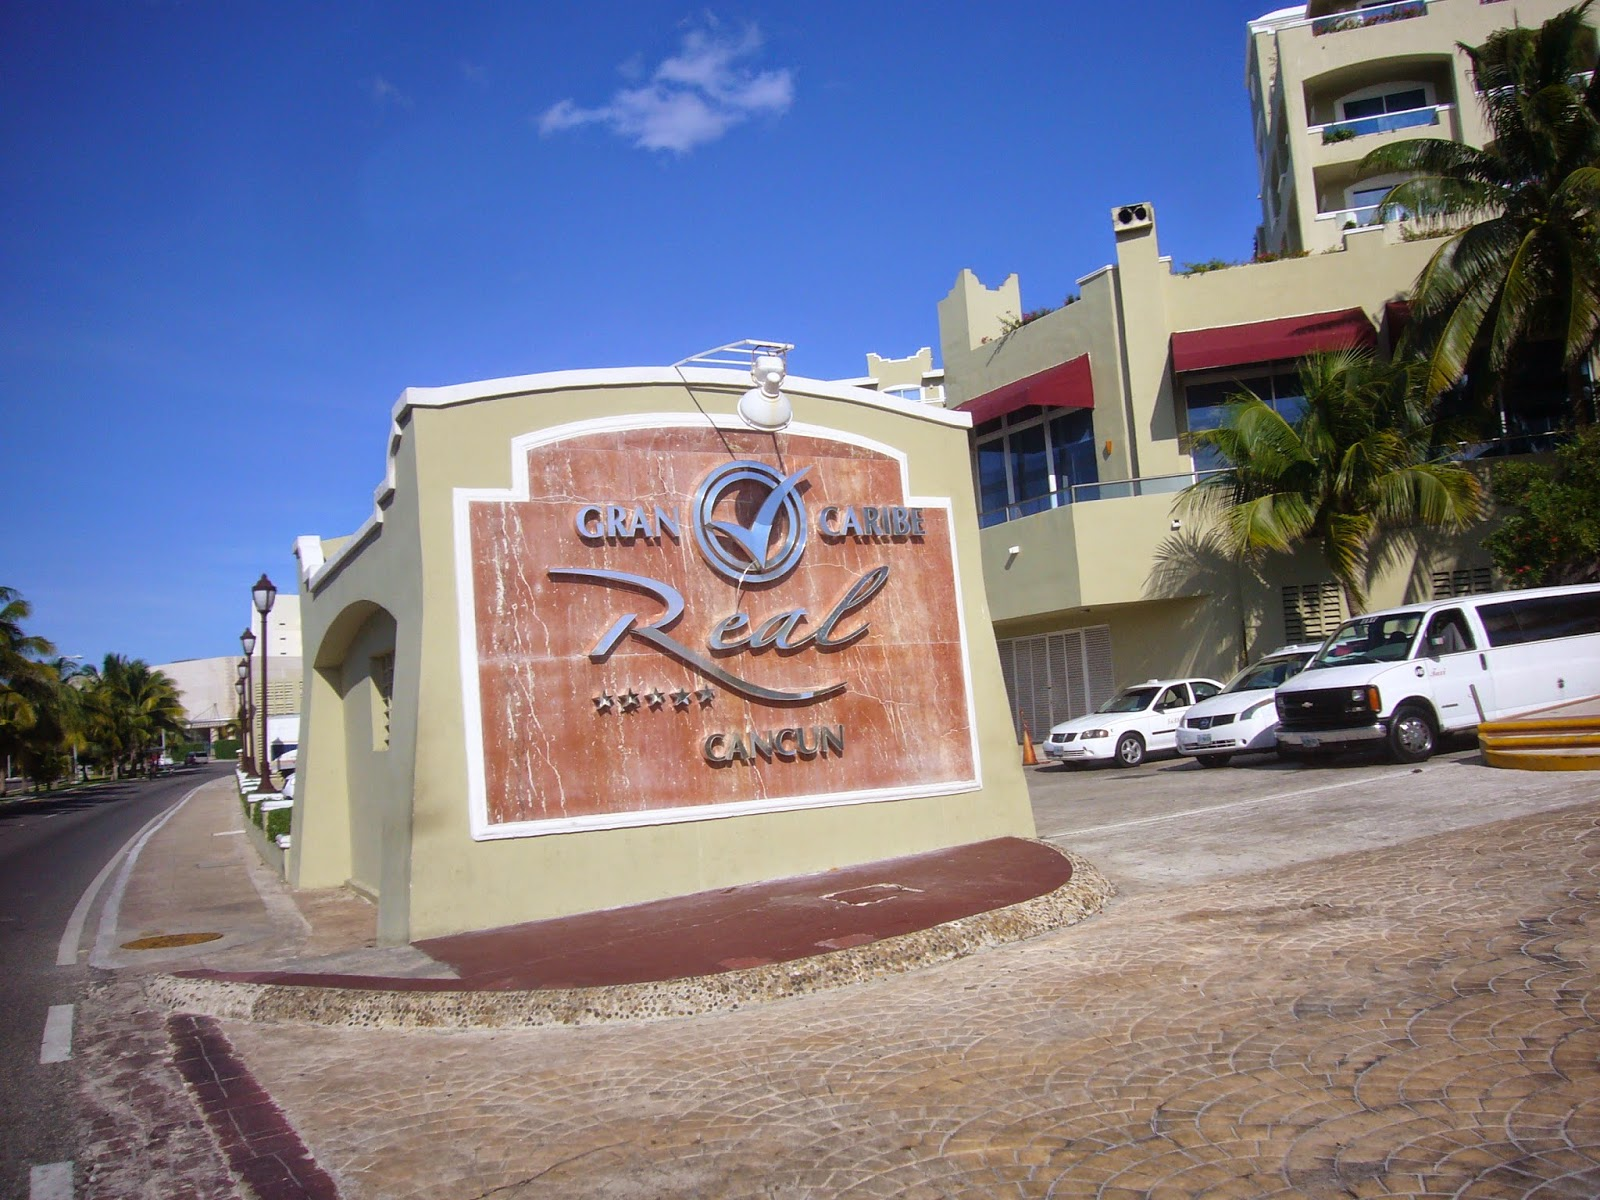 Gran Caribe Real Cancun Sikh priest